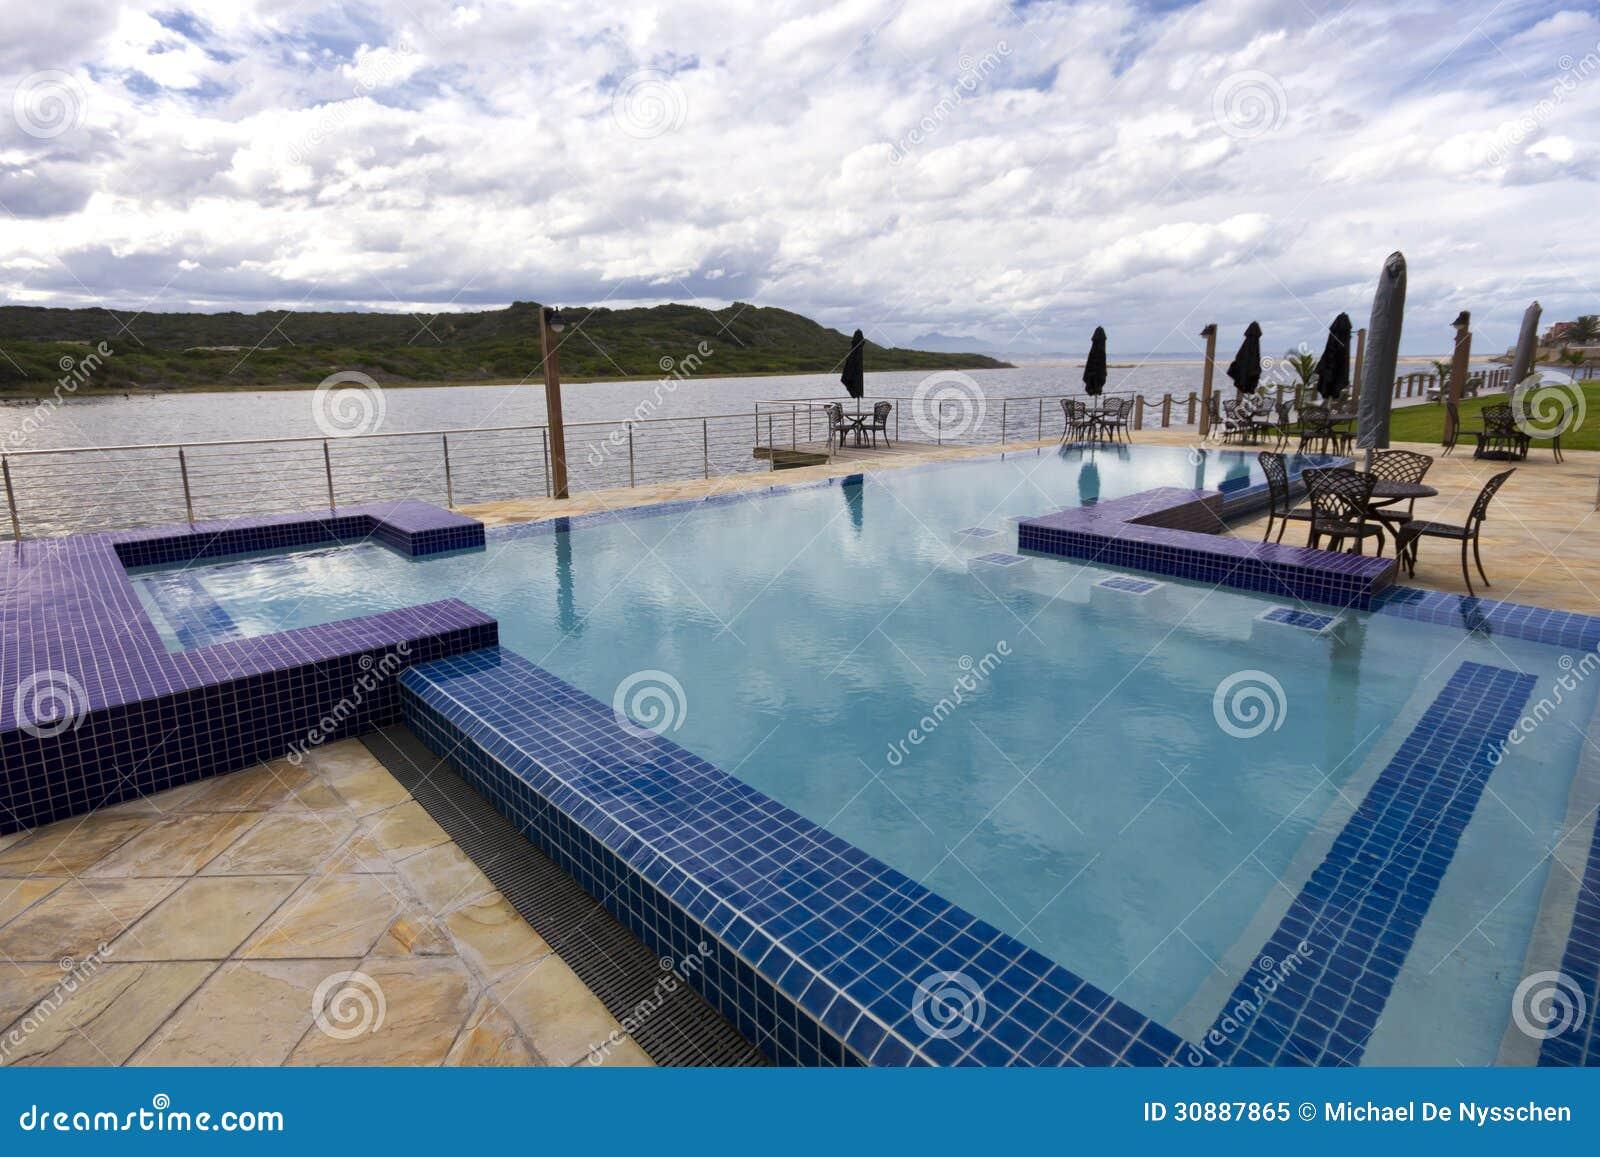 Luxury Swimming Pool Beside Lagoon Royalty Free Stock Photo Image 30887865